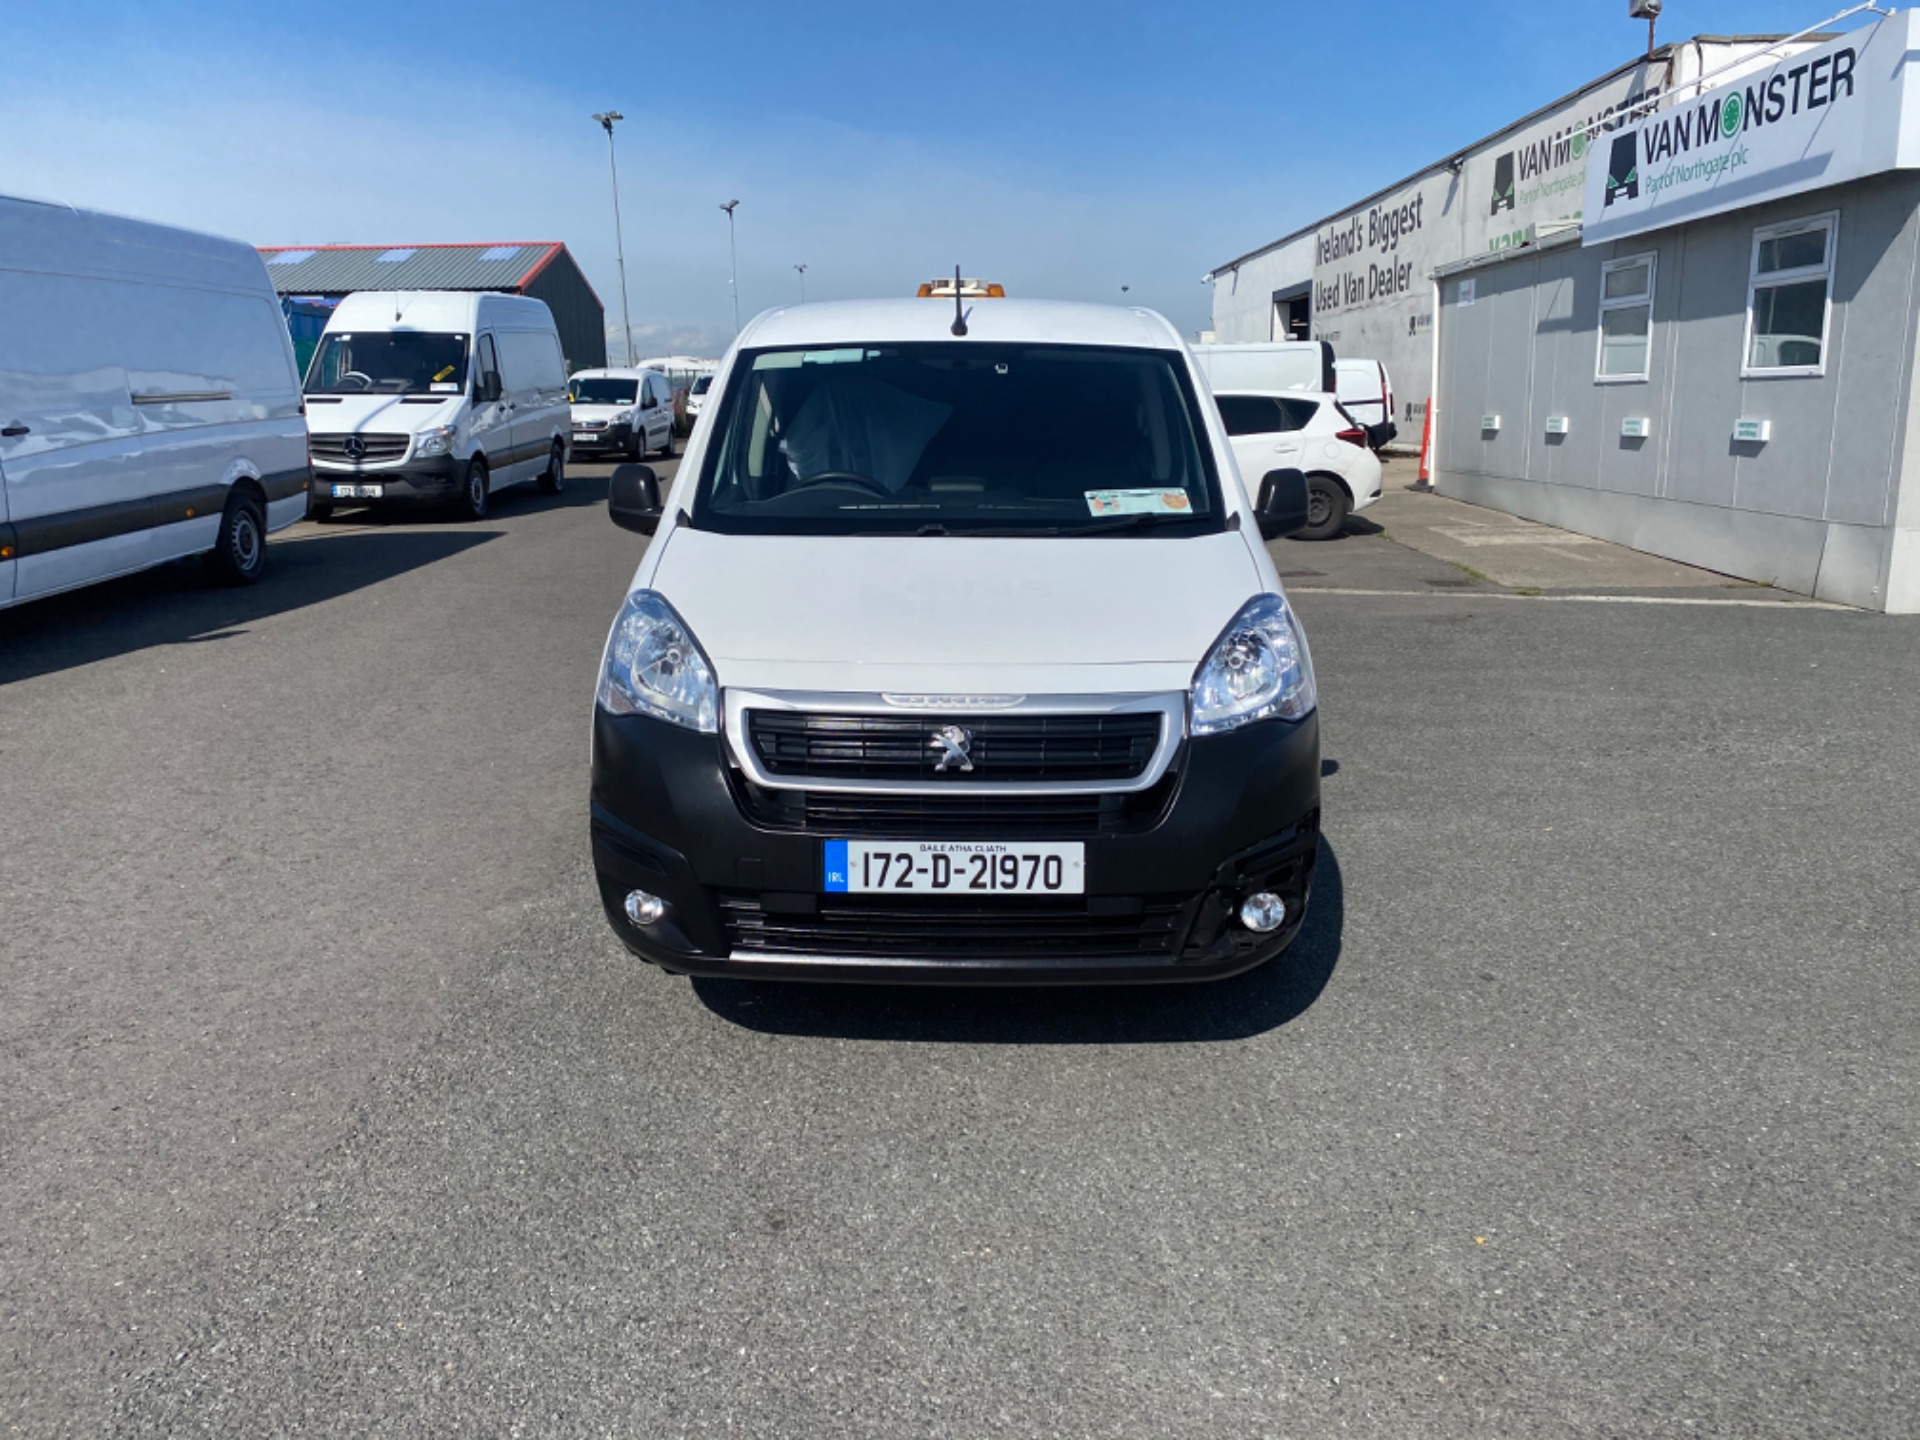 2017 Peugeot Partner Professional 1.6 Blue HDI 100 (172D21970) Image 2